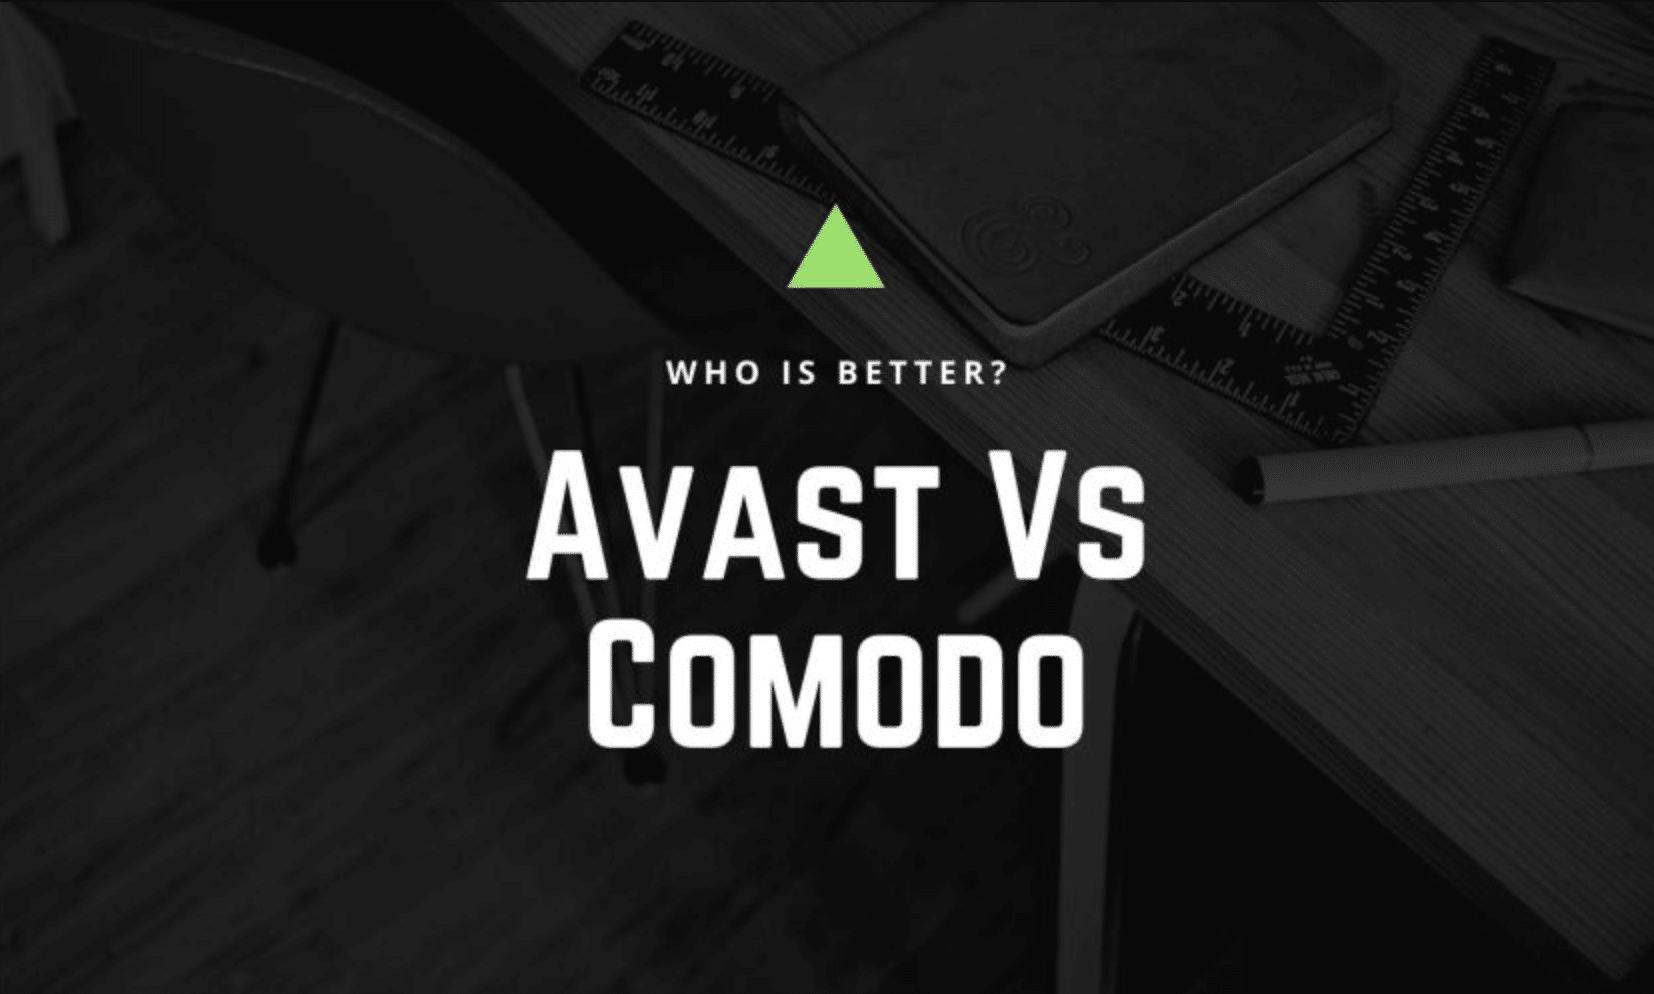 Avast vs Comodo